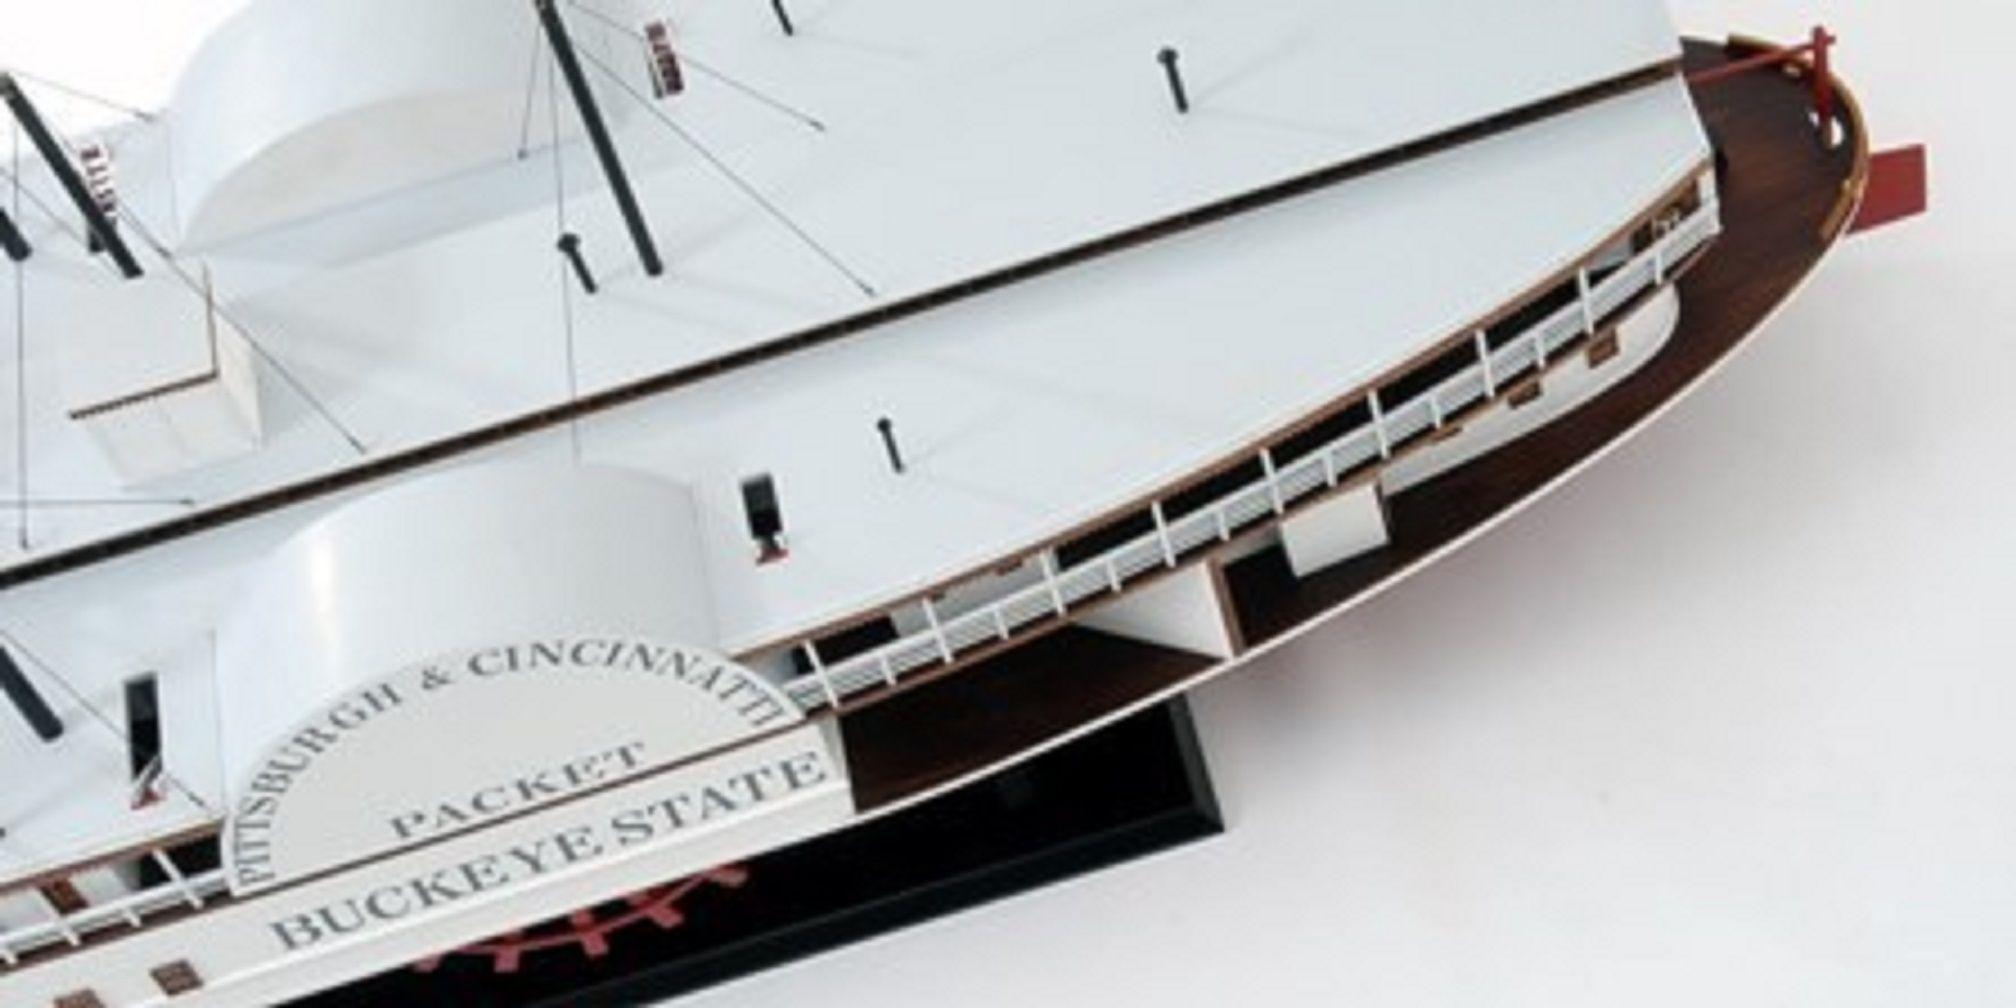 1192-7029-Buckeye-Paddle-Steamer-Premier-Range